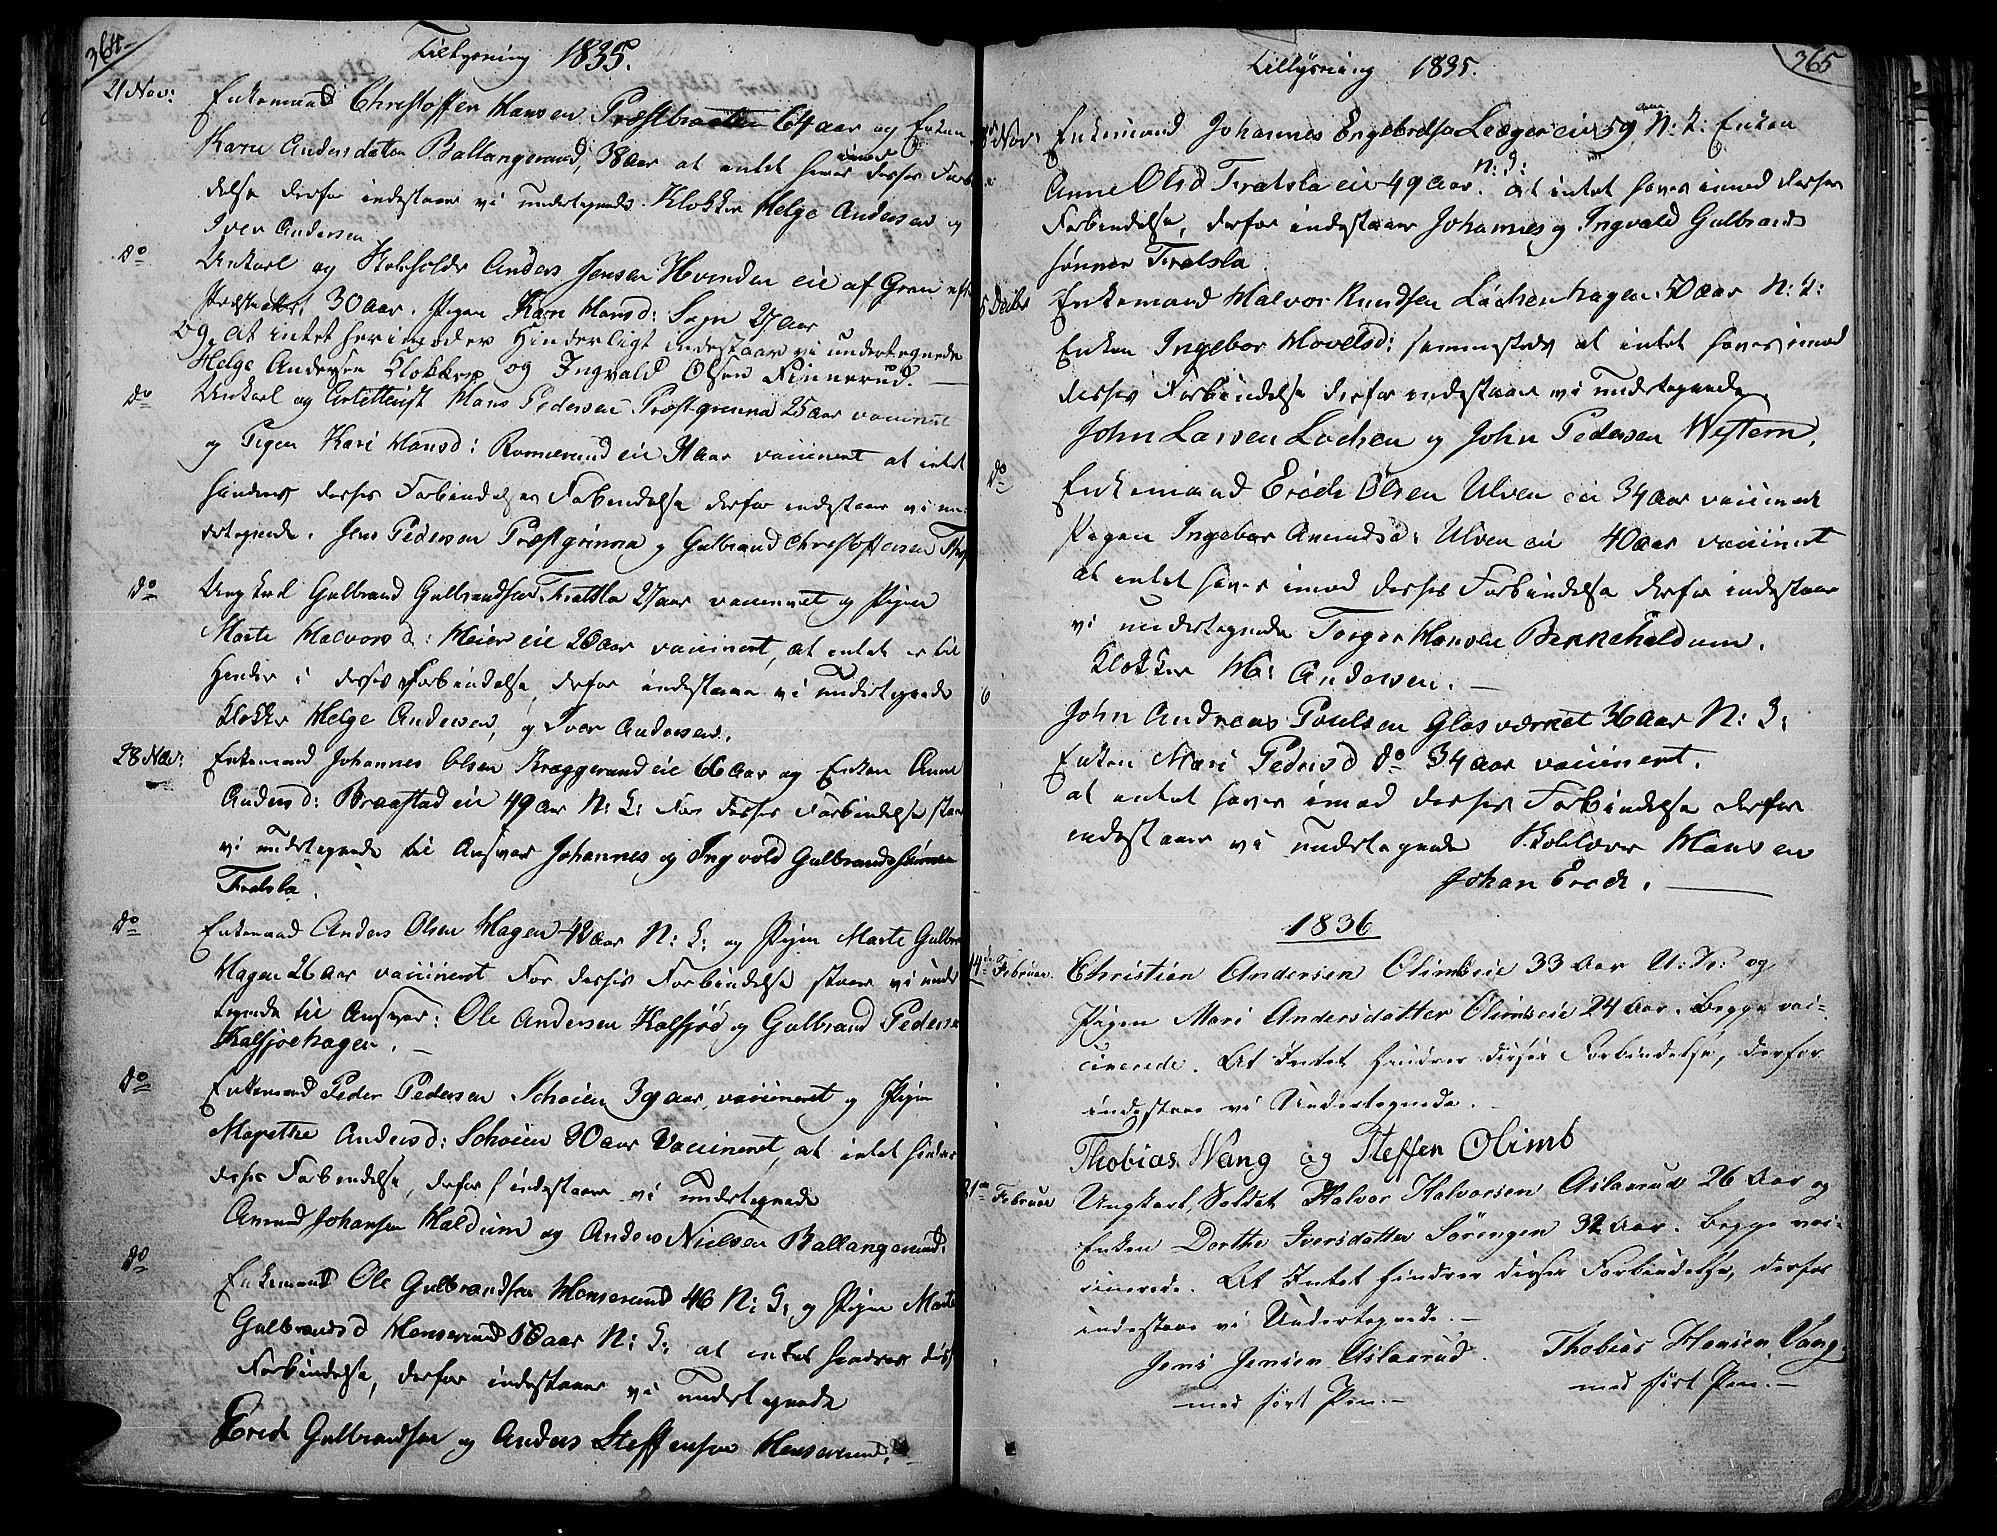 SAH, Jevnaker prestekontor, Ministerialbok nr. 4, 1800-1861, s. 364-365